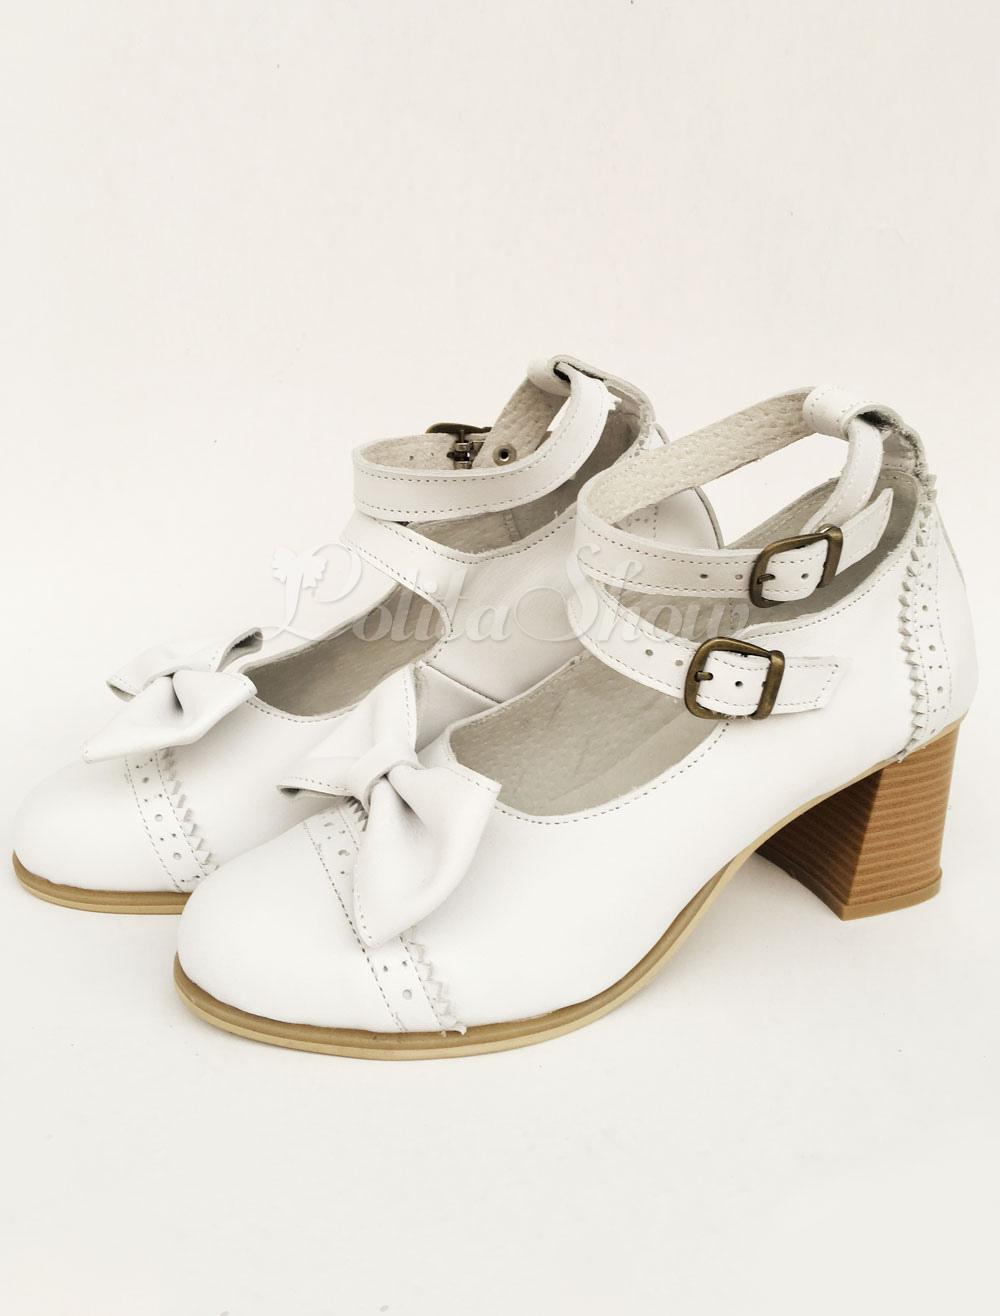 10a4735ed97 Lolitashow Lolita Chunky Heels White Double Strap Sweet Lolita Shoes With  Bow - Lolitashow.com